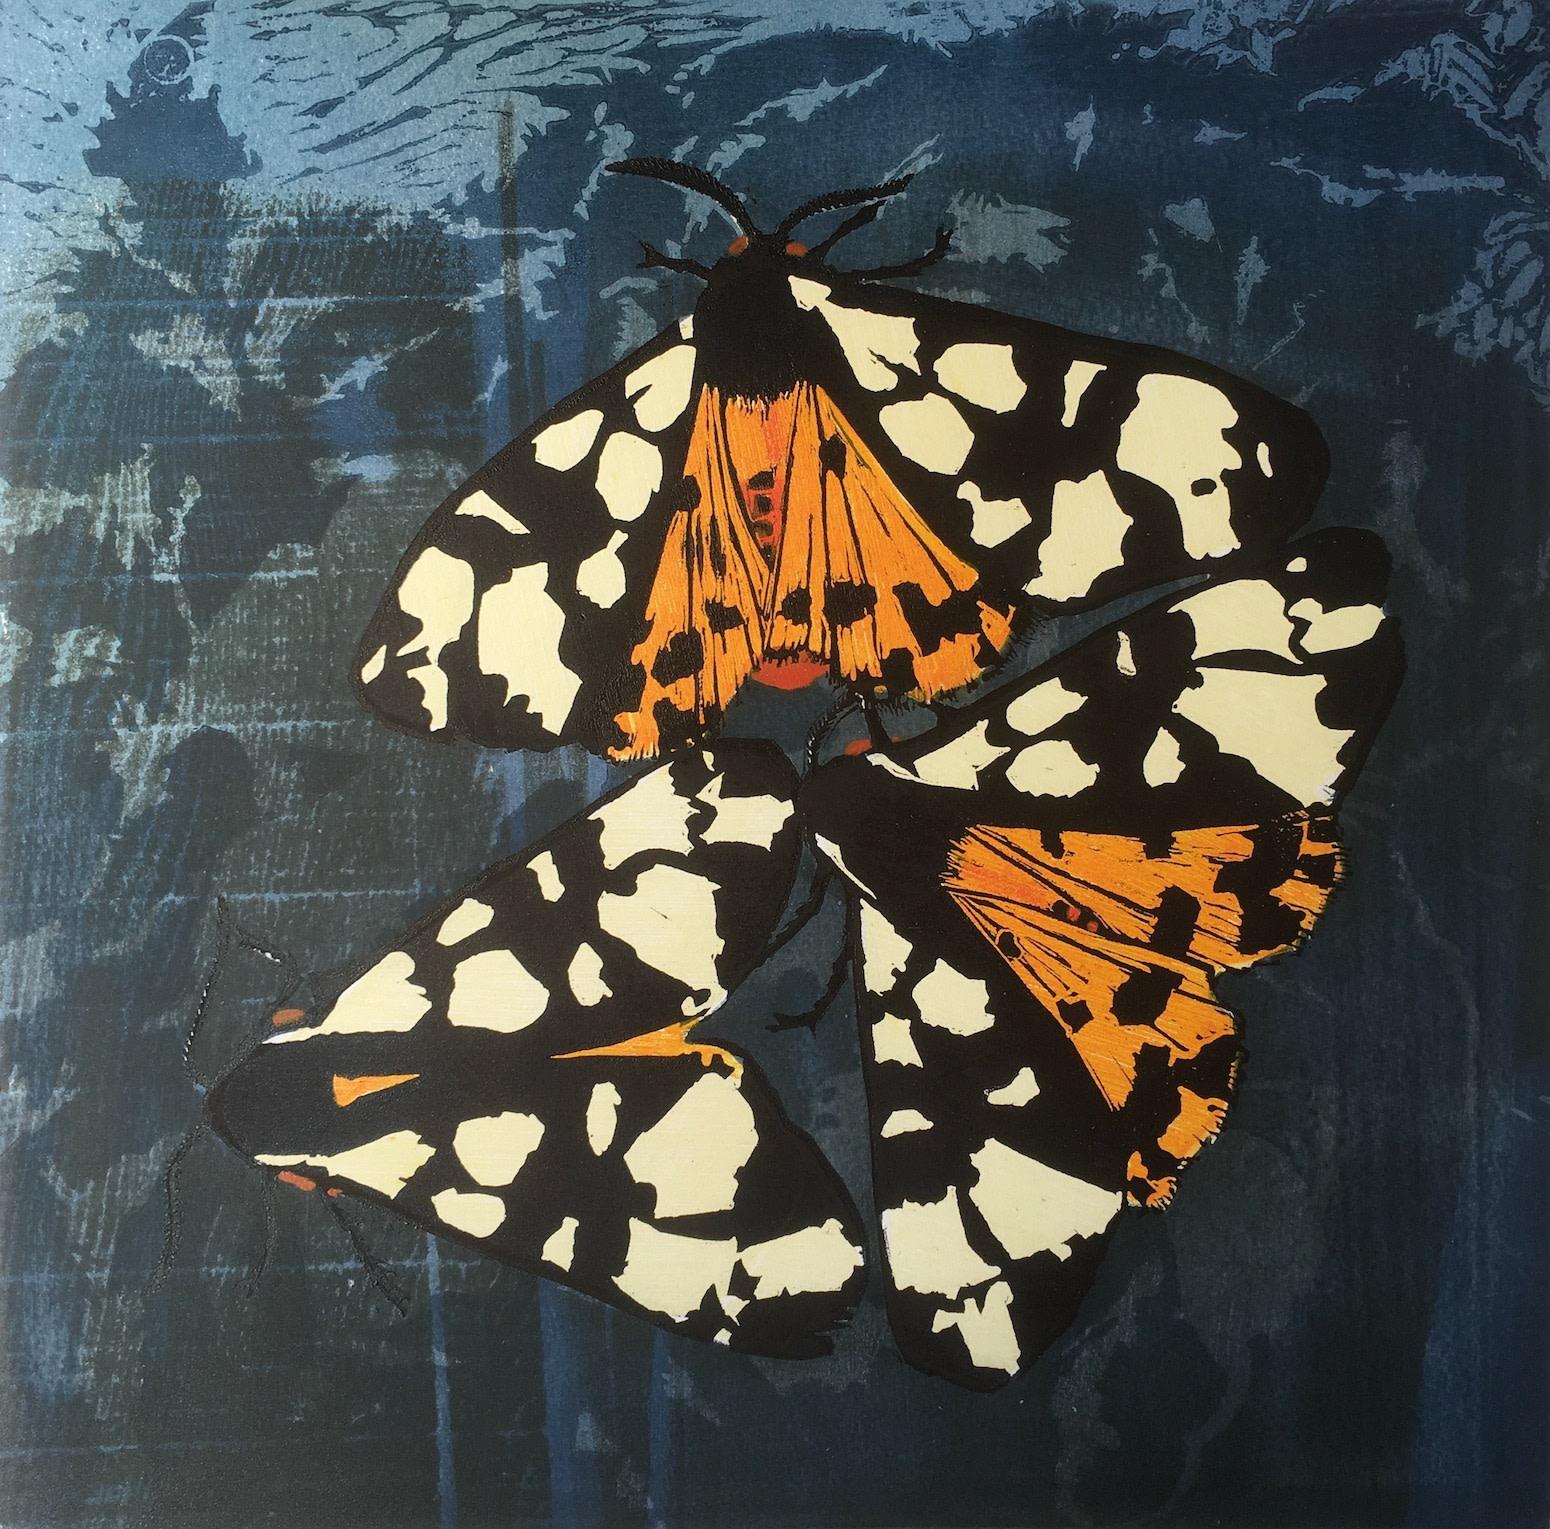 "<span class=""link fancybox-details-link""><a href=""/exhibitions/24/works/artworks_standalone11446/"">View Detail Page</a></span><div class=""artist""><span class=""artist""><strong>Julia Manning RE</strong></span></div><div class=""title""><em>My Garden, Cream Spots</em></div><div class=""medium"">wood cuts and linocut</div><div class=""dimensions"">65 x 64 cm framed<br>45 x 45 cm image size</div><div class=""edition_details"">edition of 10</div>"